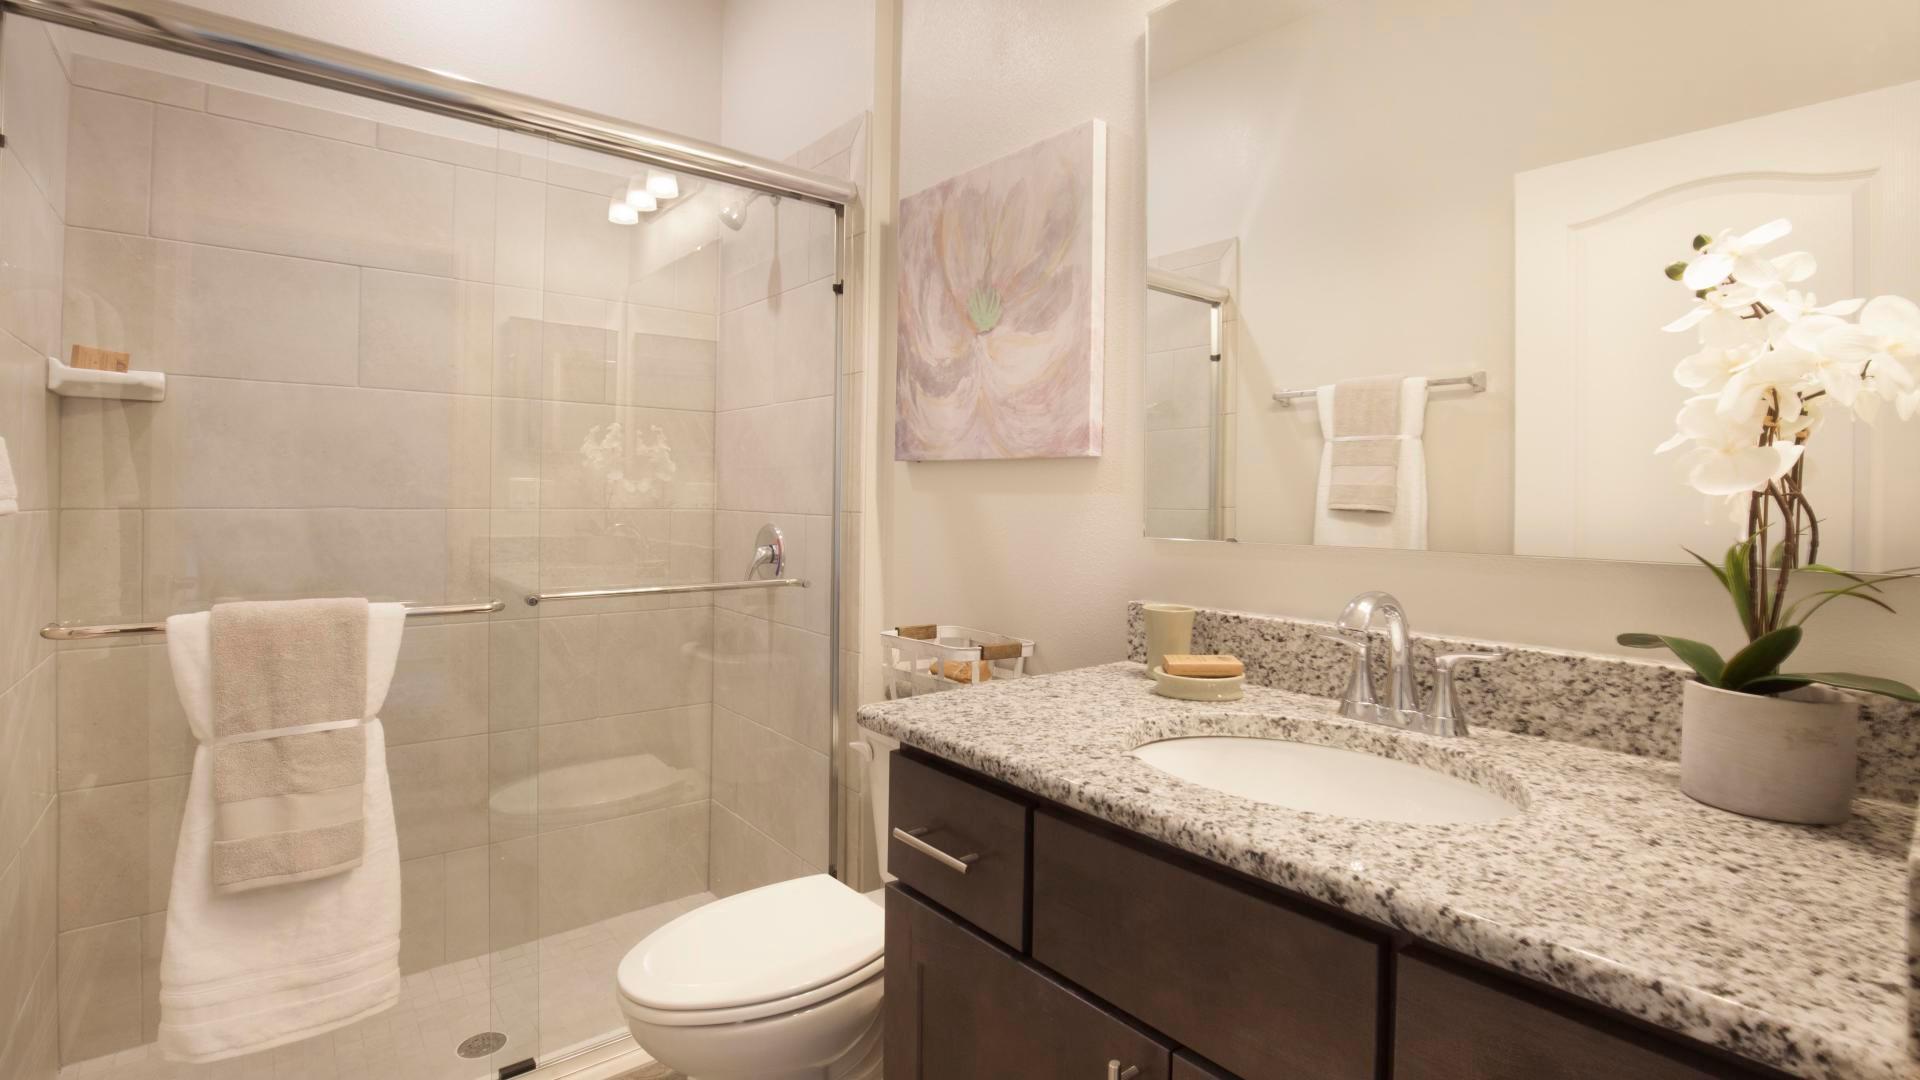 Bathroom featured in the Huntington By Maronda Homes in Daytona Beach, FL